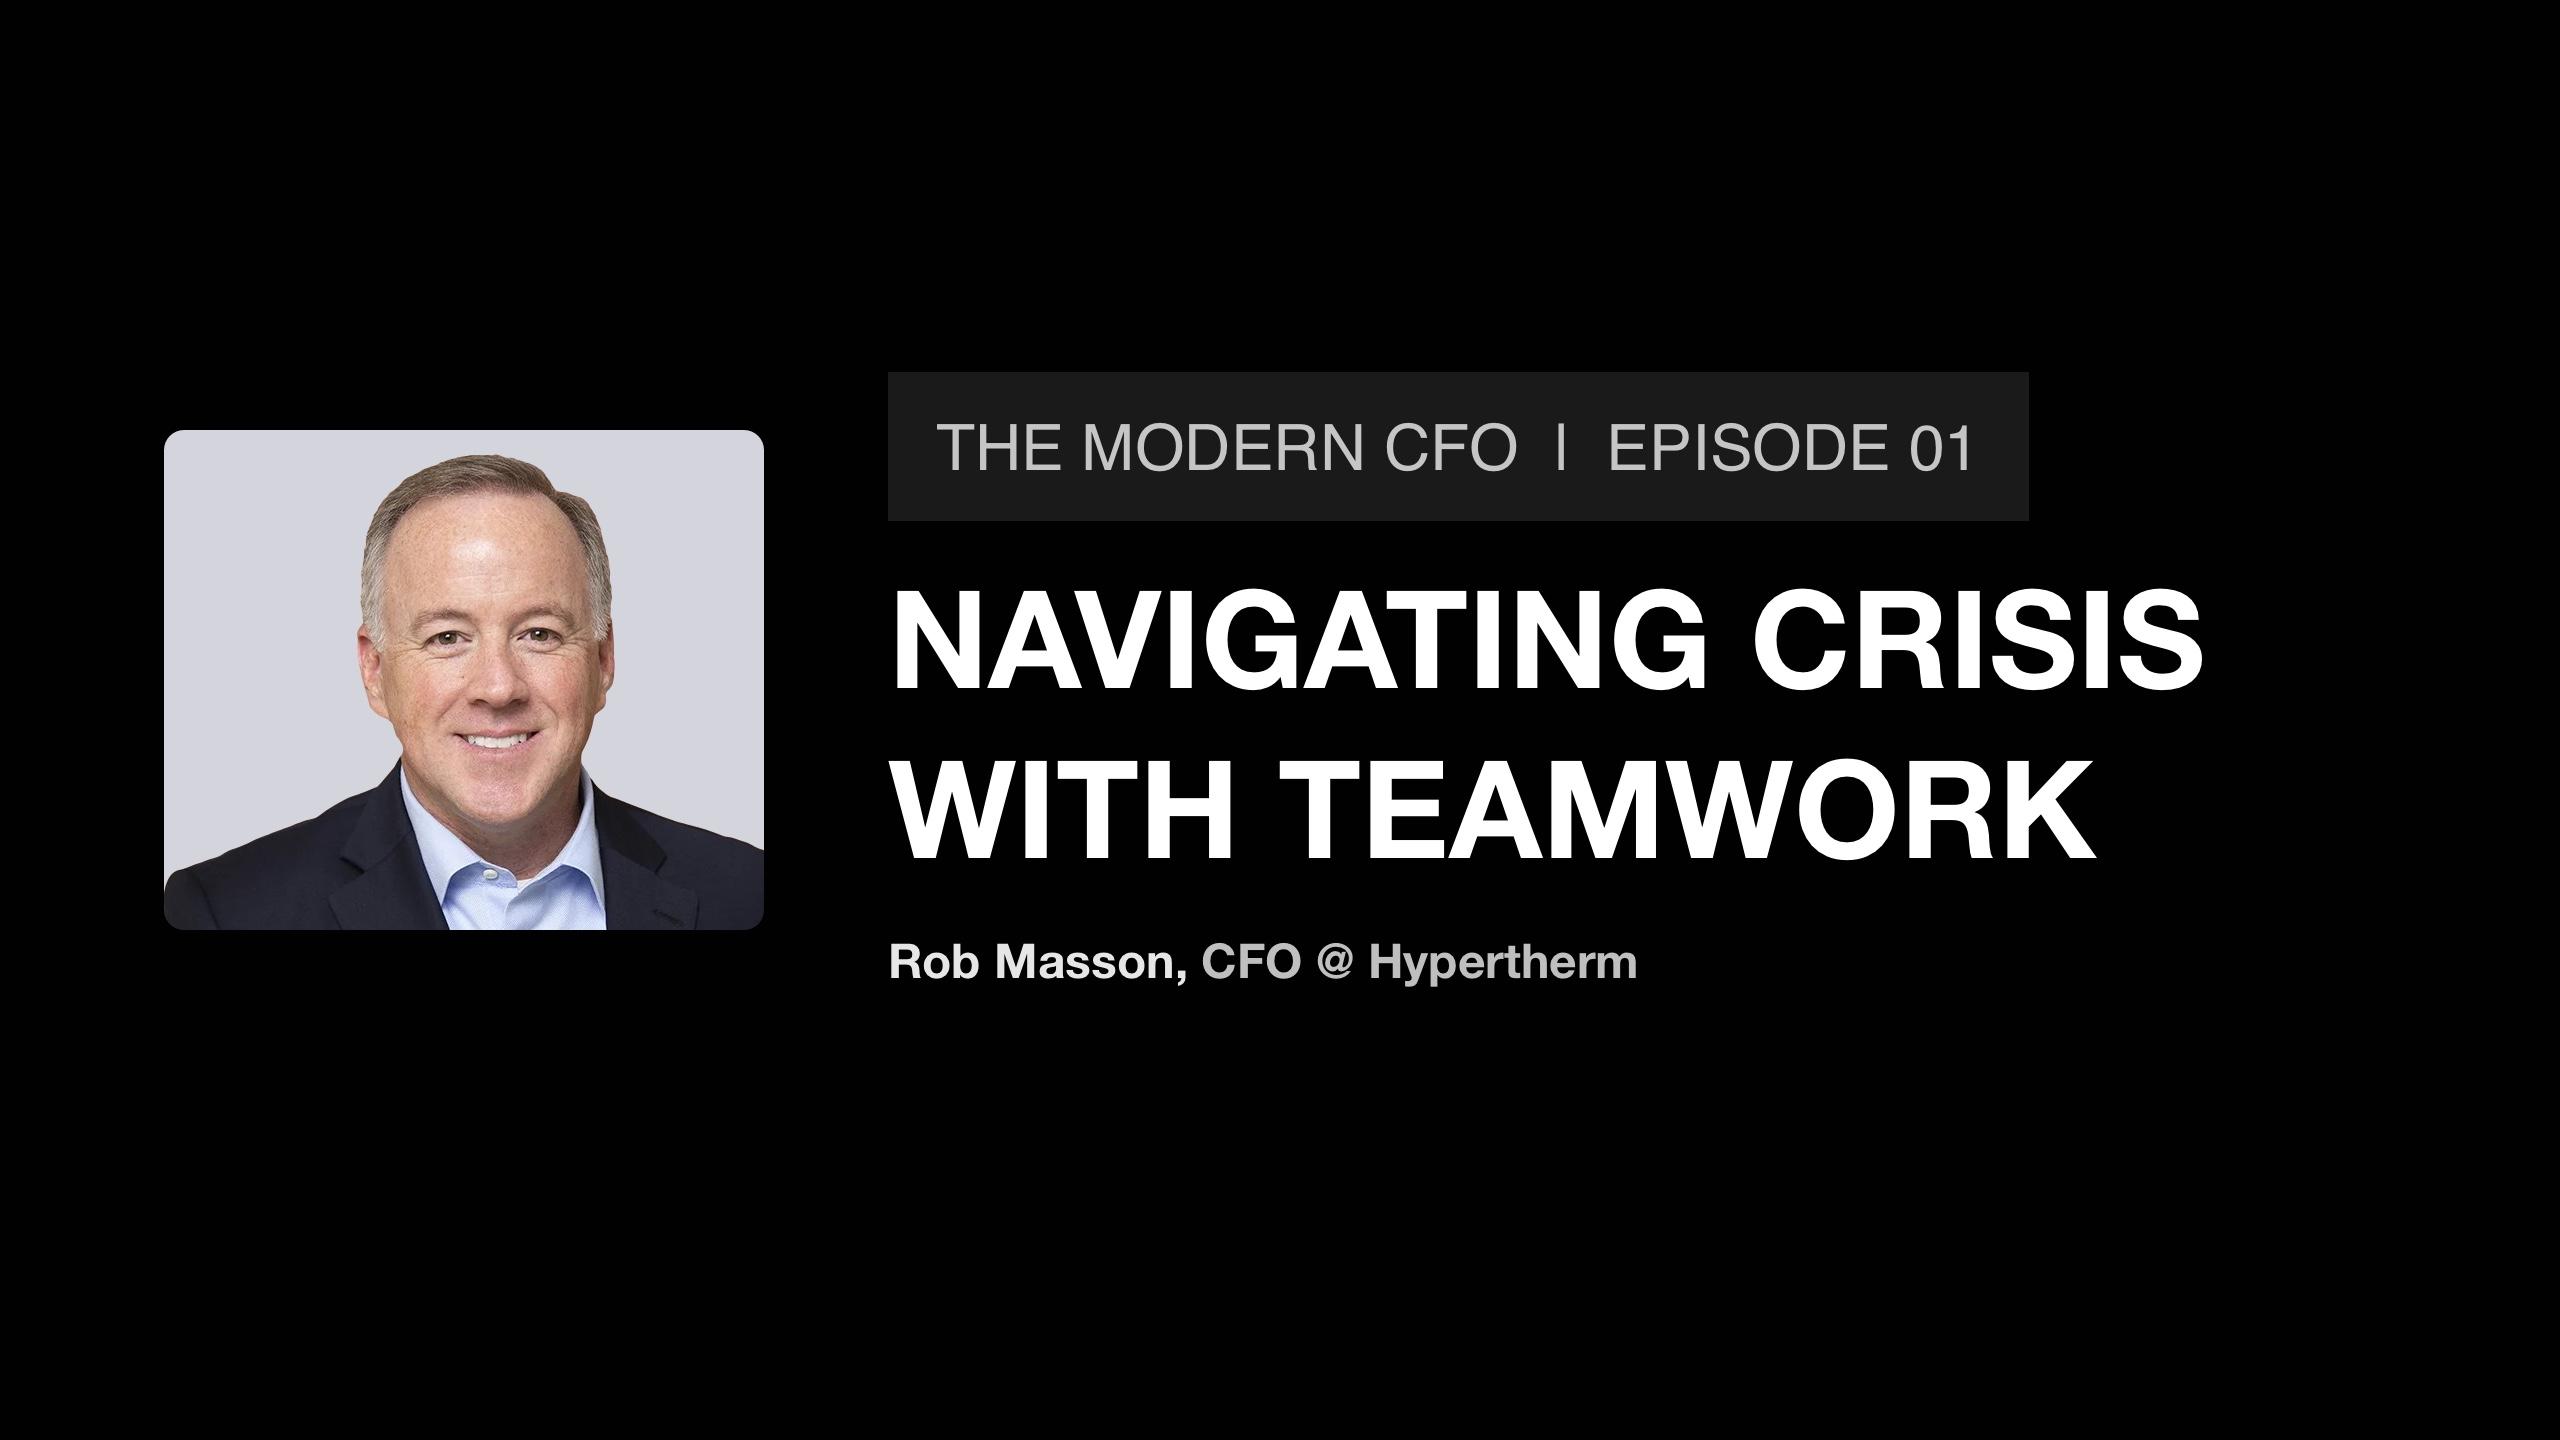 How Hypertherm's CFO Rob Masson navigates crisis with teamwork